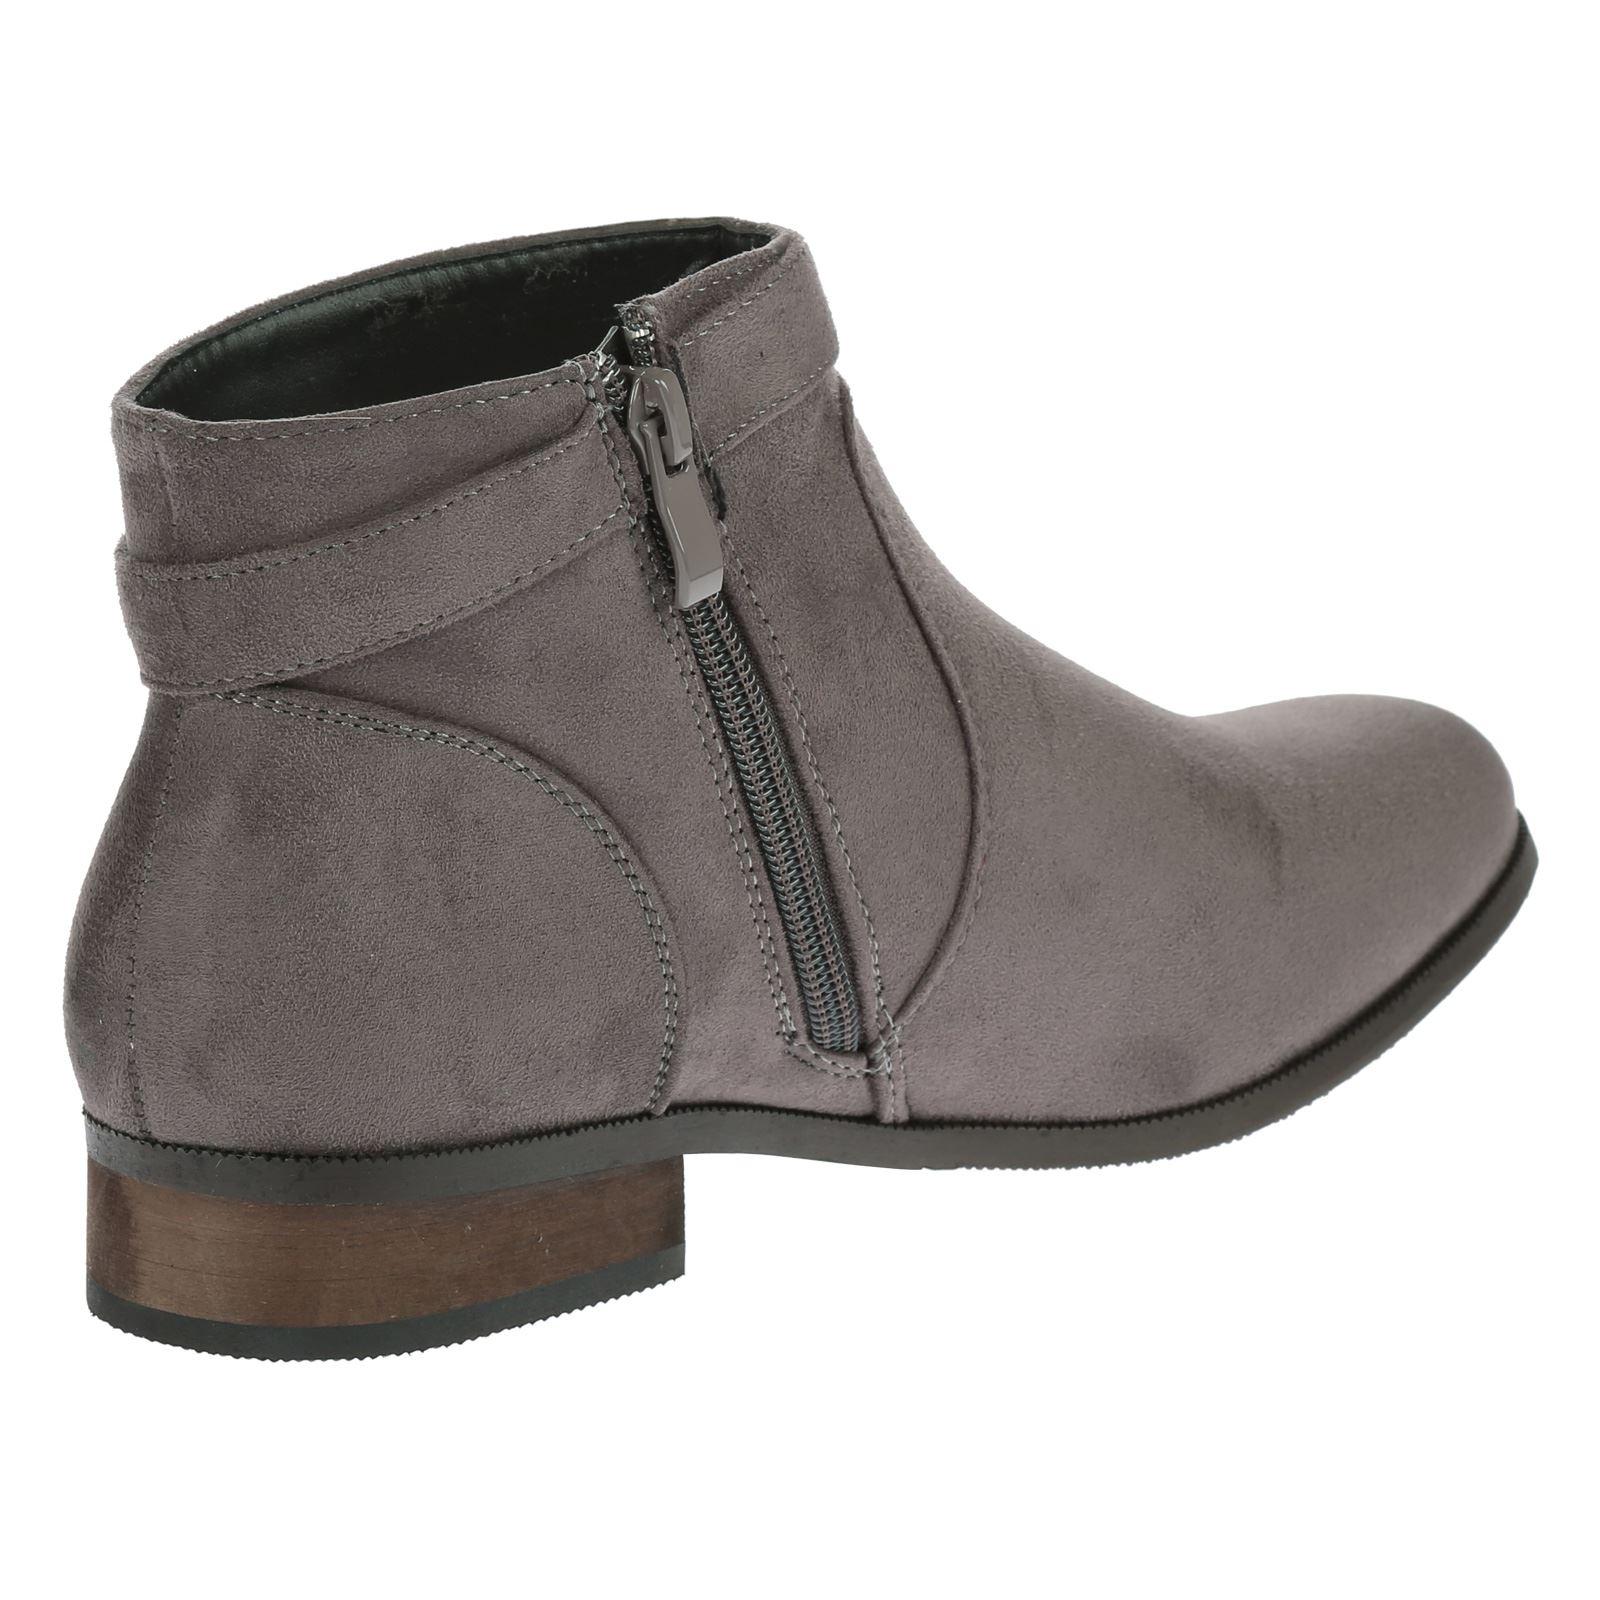 womens boots ankle tassel low heel flat casual work